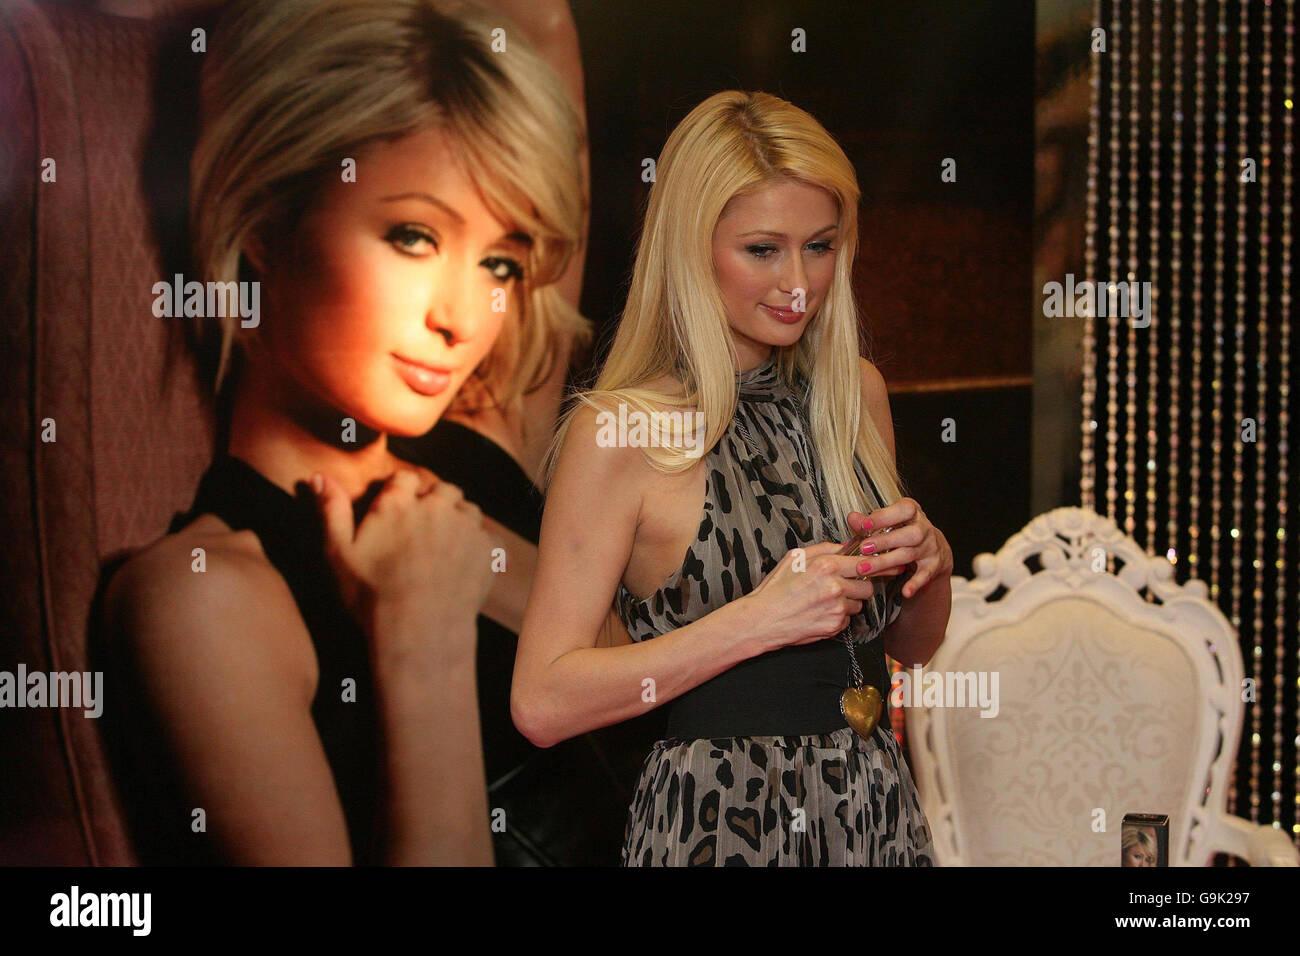 Paris Hilton launches her new perfume Heiress - Dublin - Stock Image